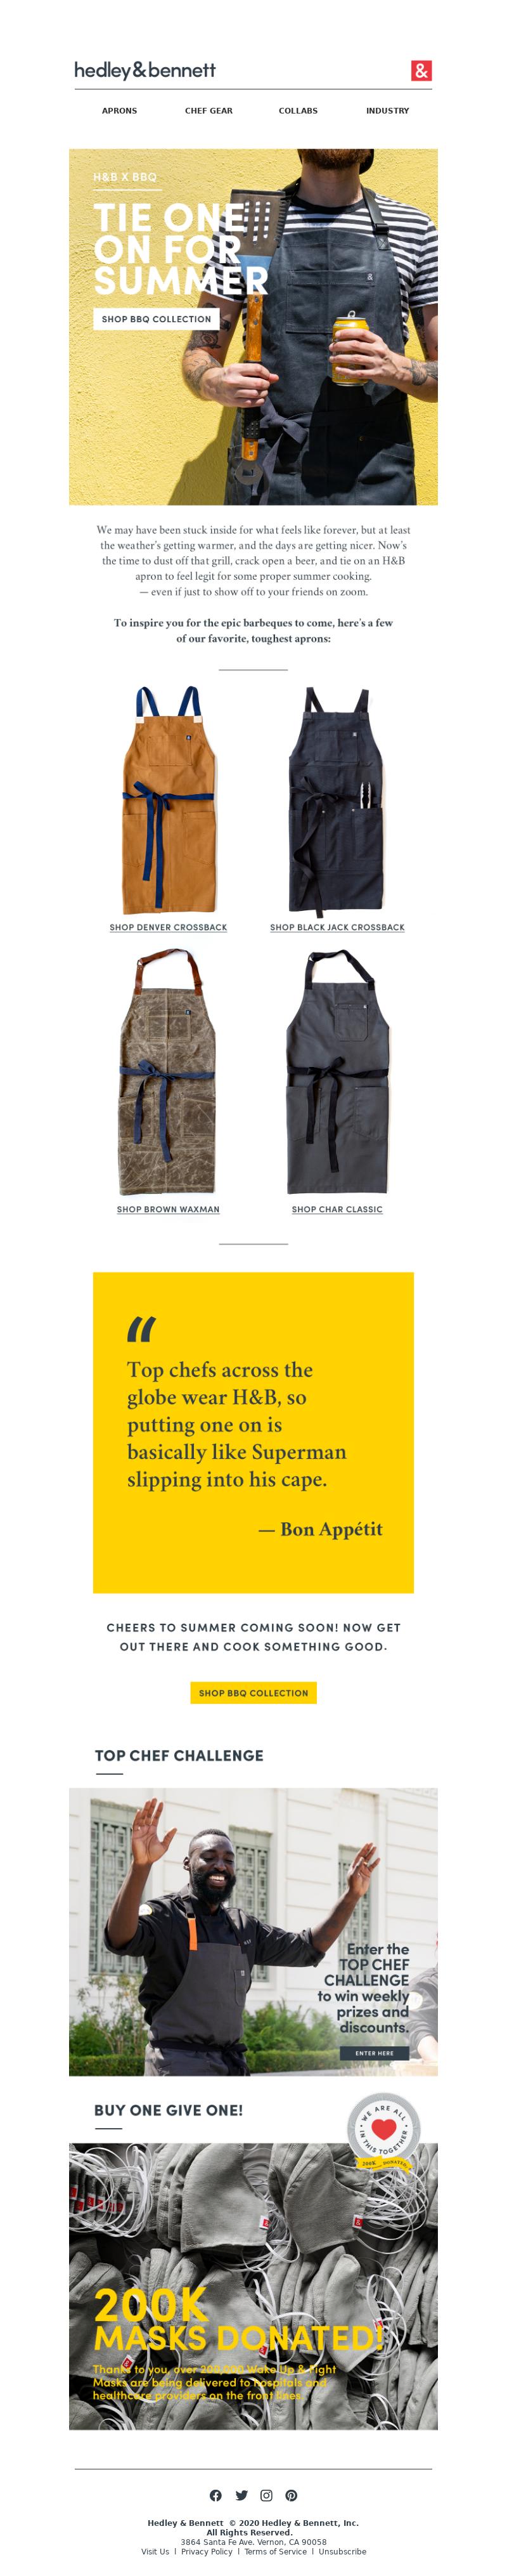 APRONS CHEF GEAR COLLABS INDUSTRY Button Text Custom Custom Custom Hedley &